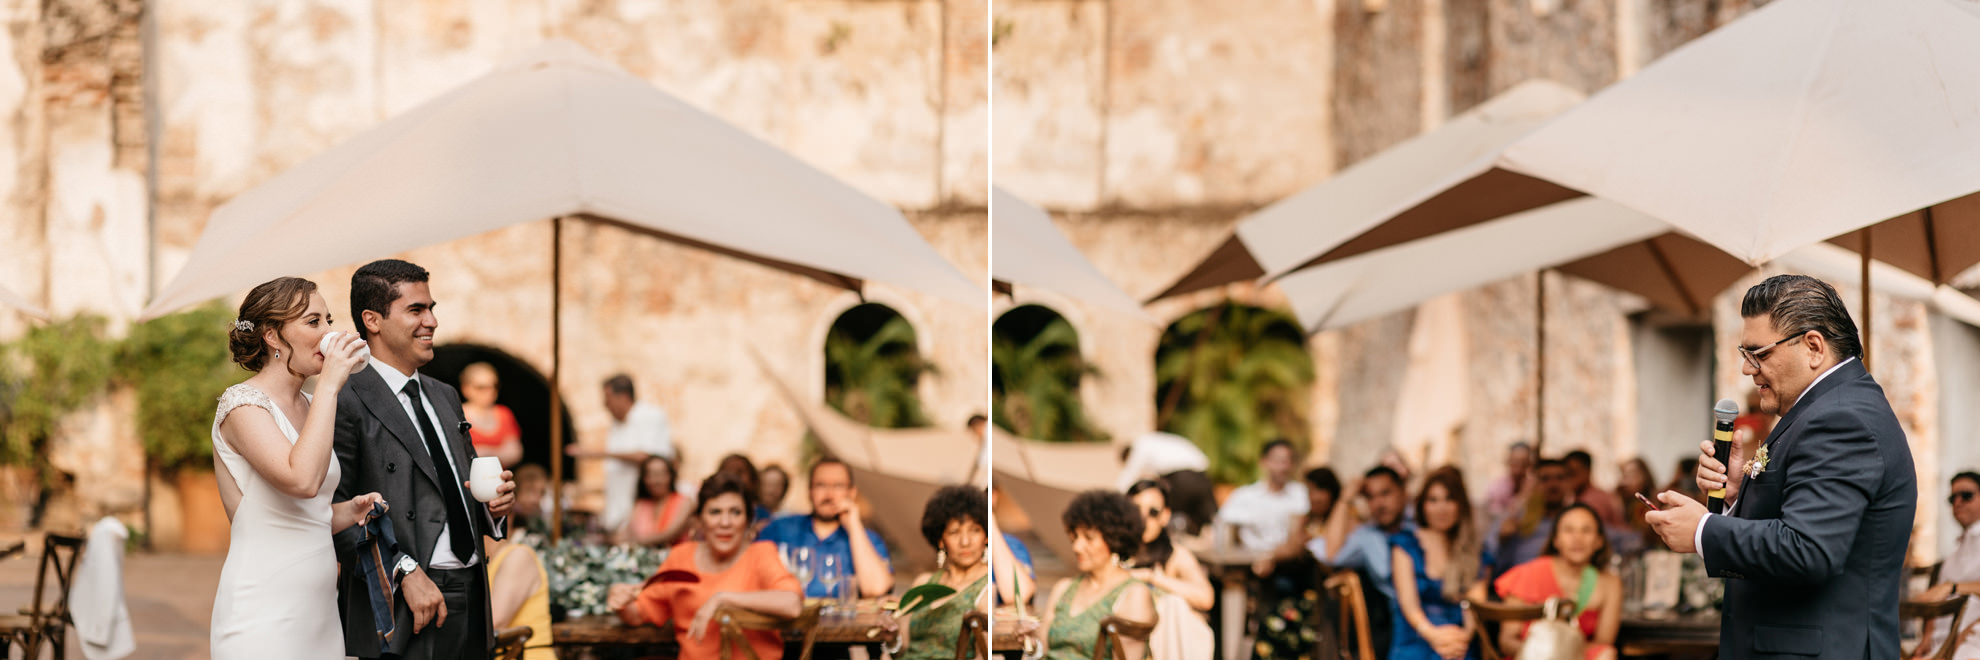 062 - wedding hacienda san carlos.jpg